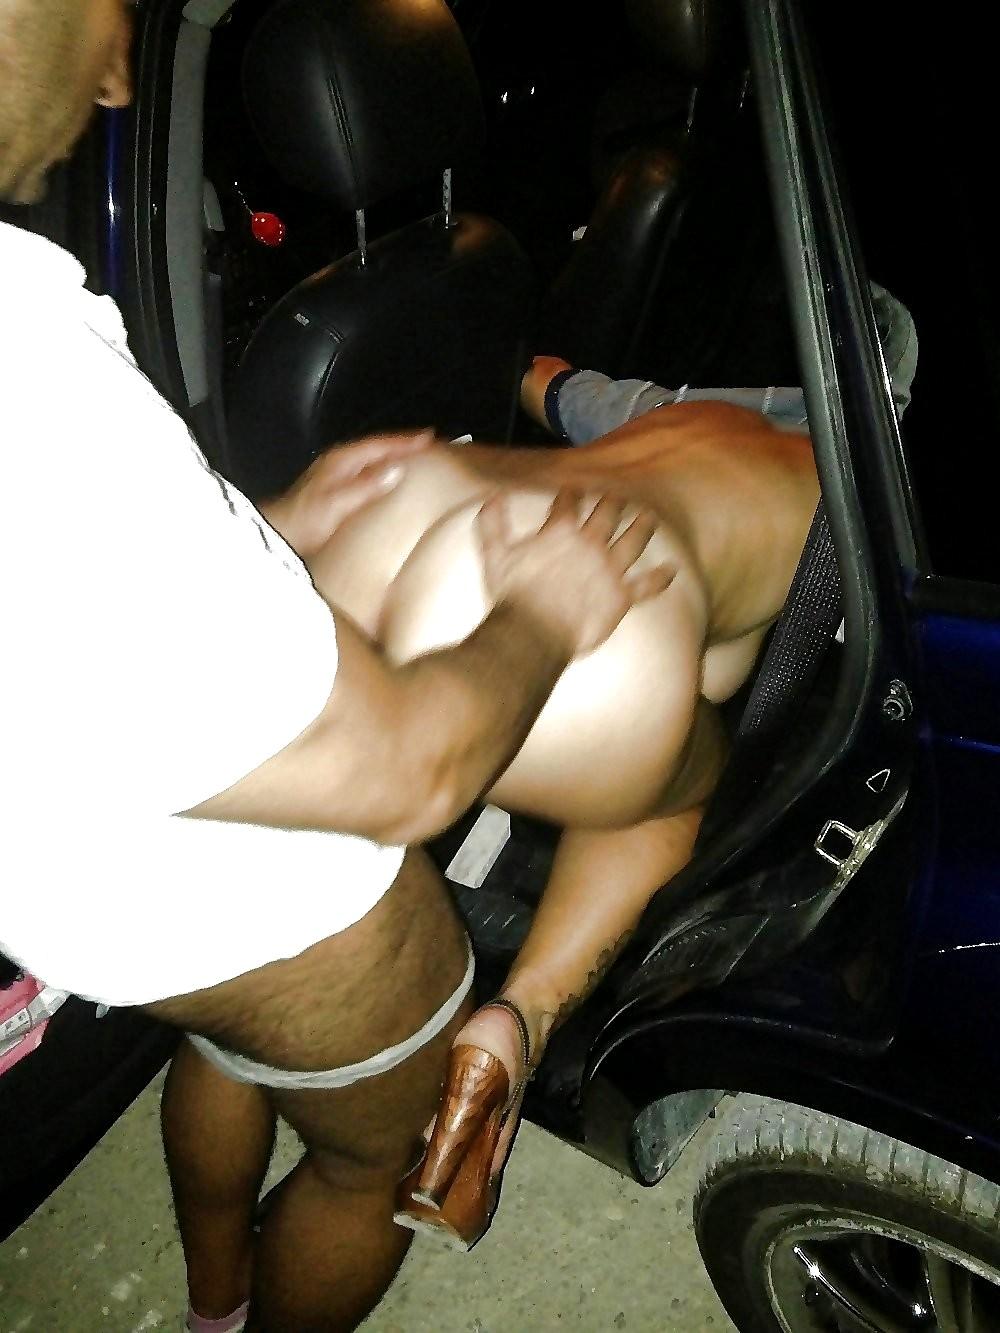 Car Sex Shoot By Infrared Camera Voyeur